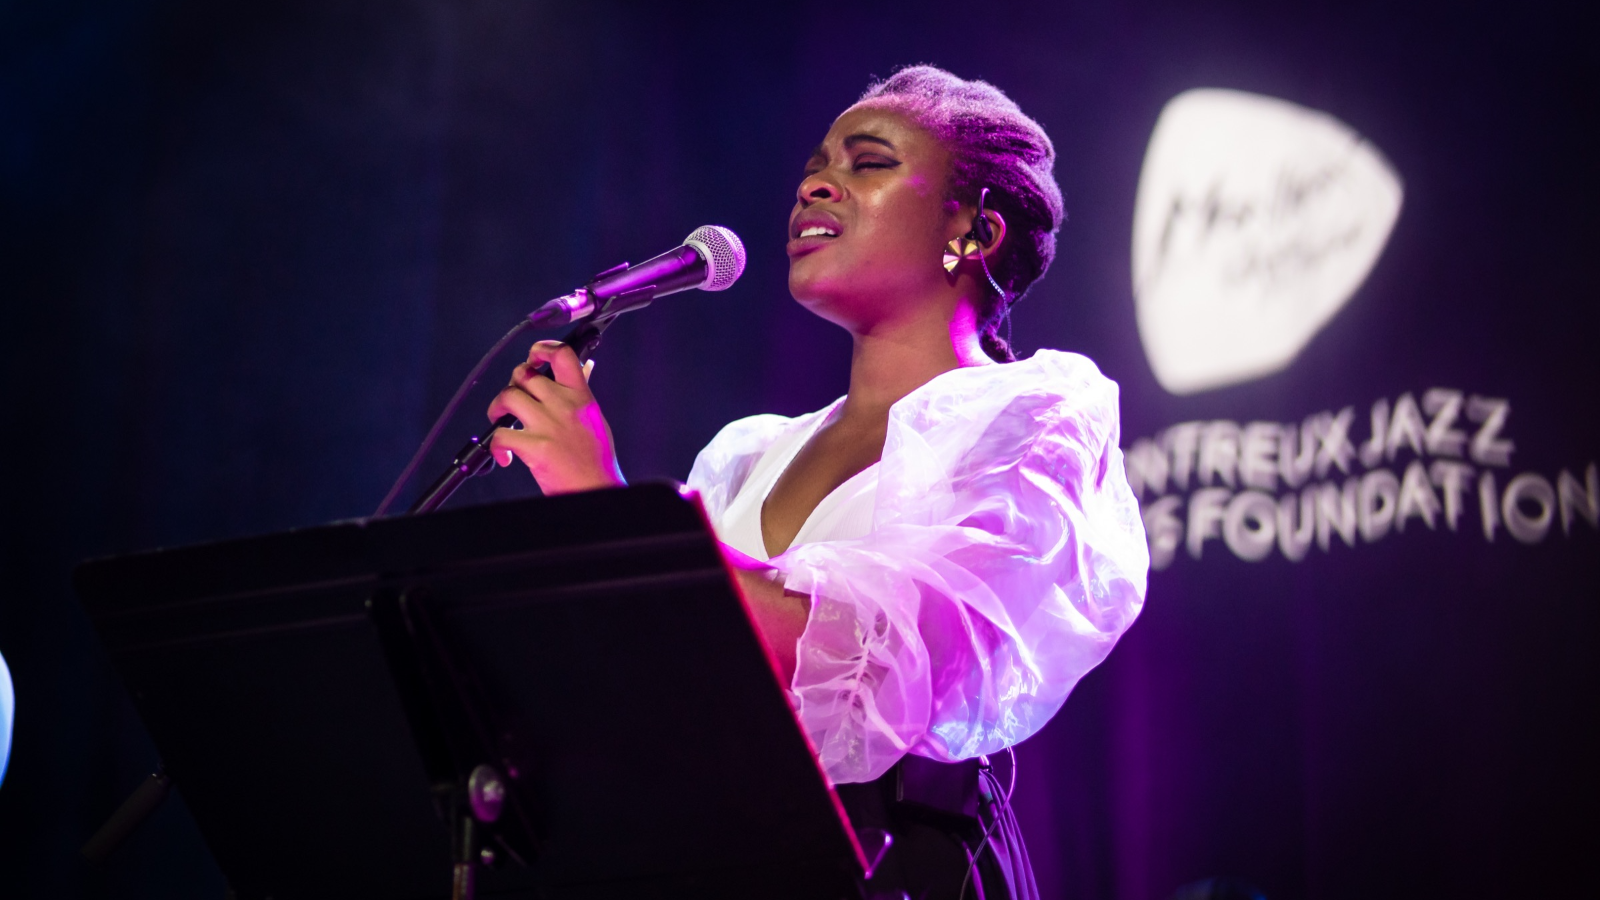 Shure & Montreux Jazz Artists Foundation Showcase 'Autumn of Music'